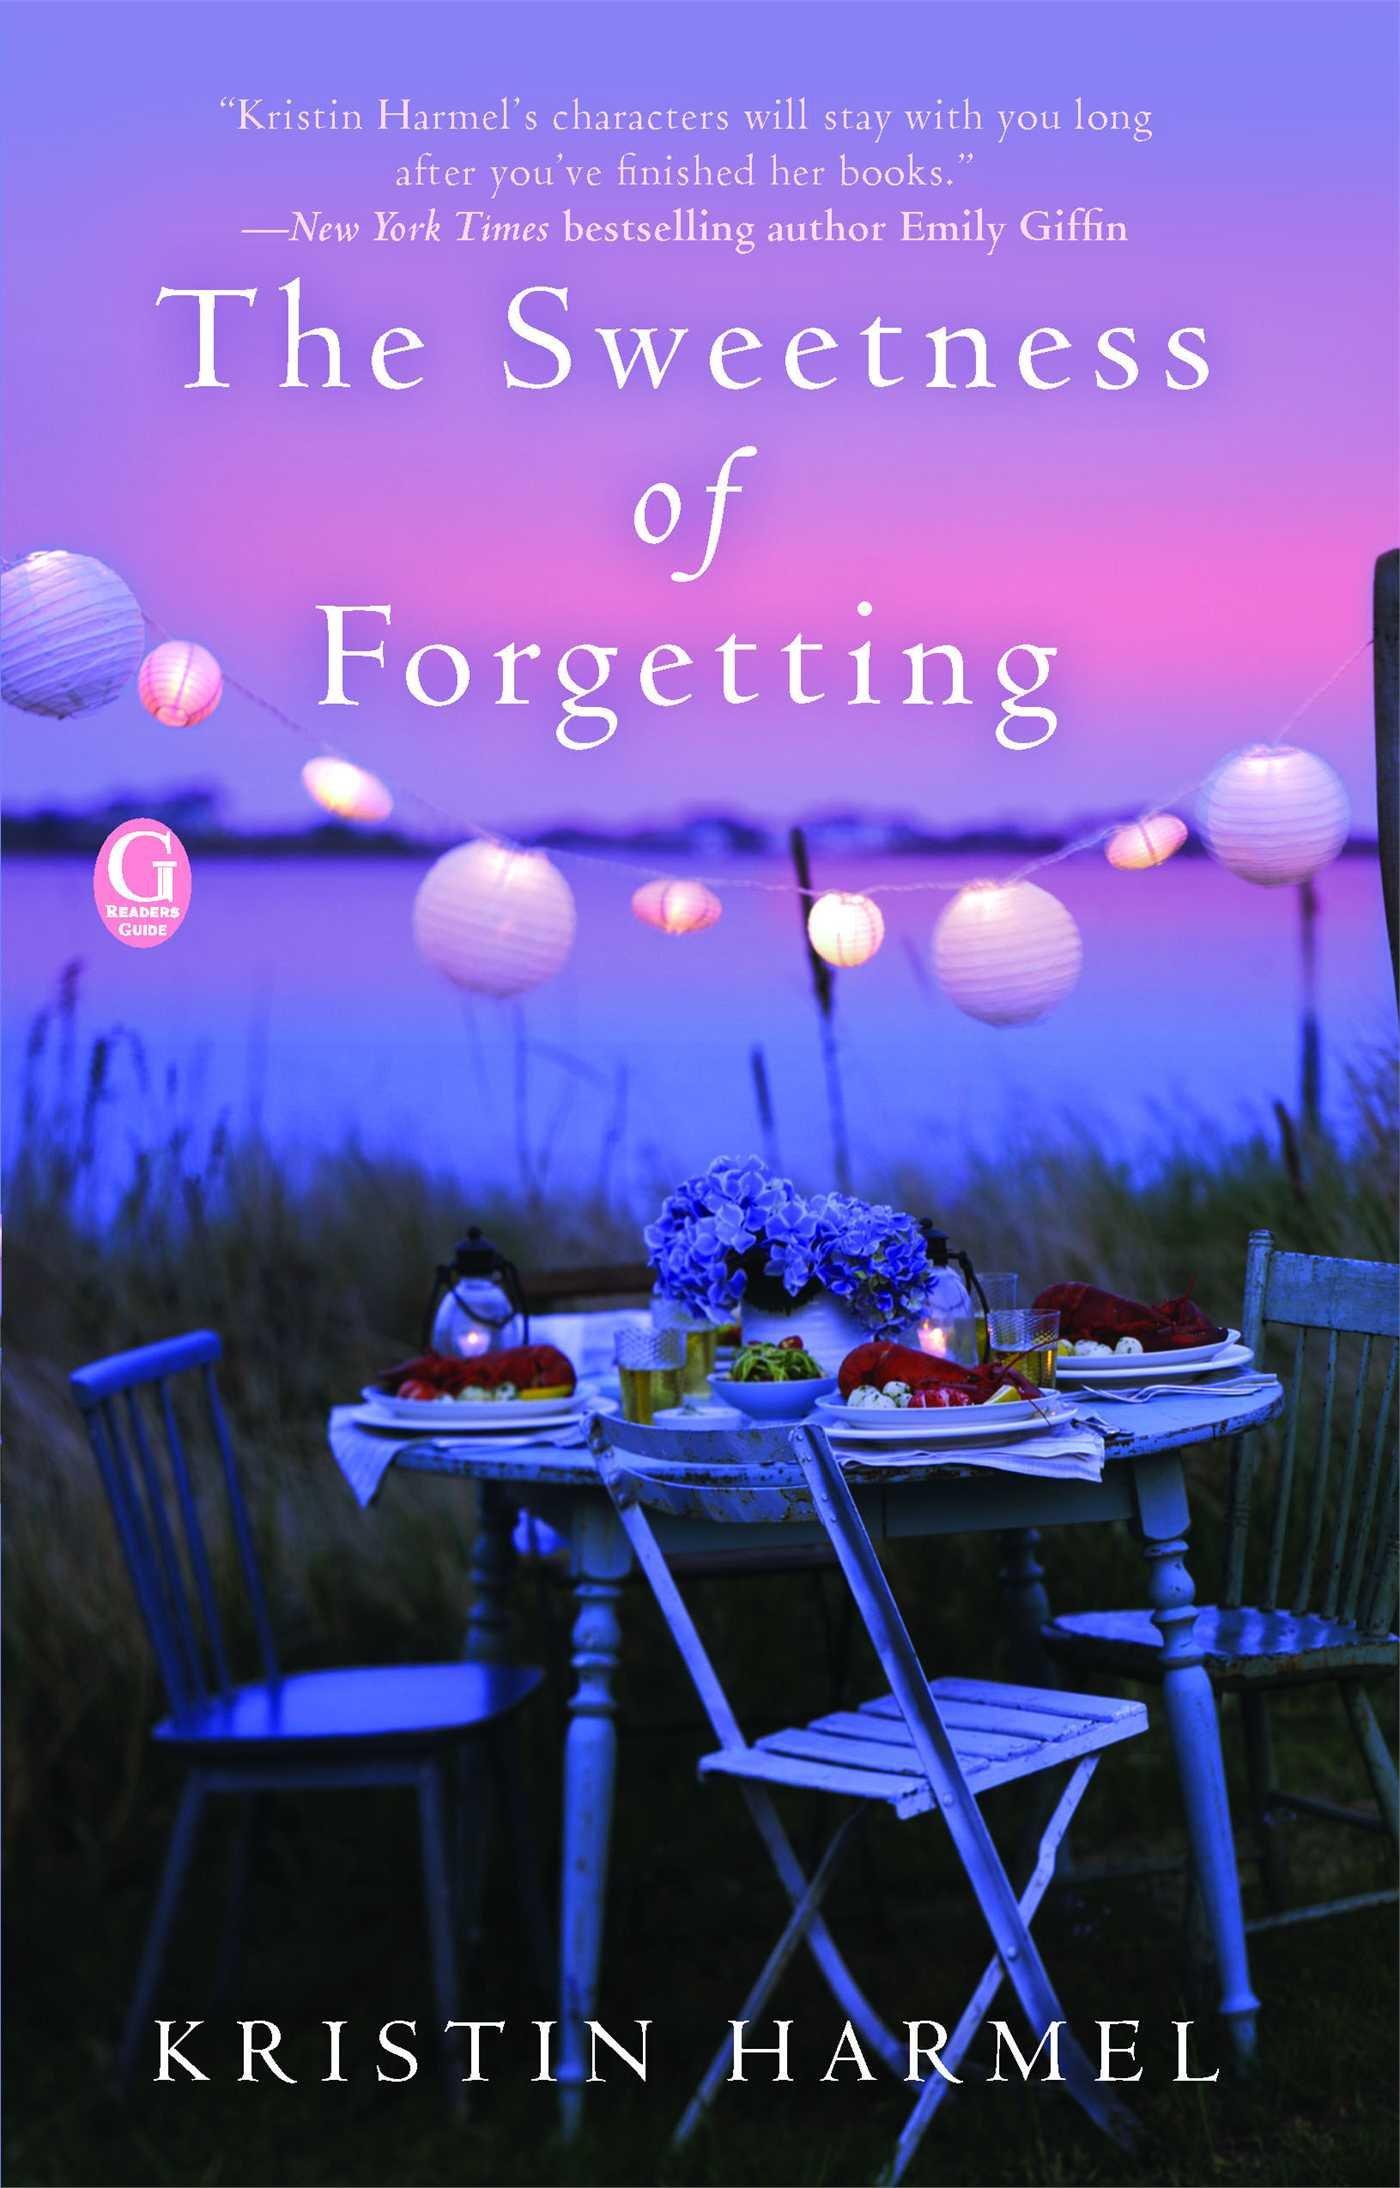 Sweetness Forgetting Kristin Harmel